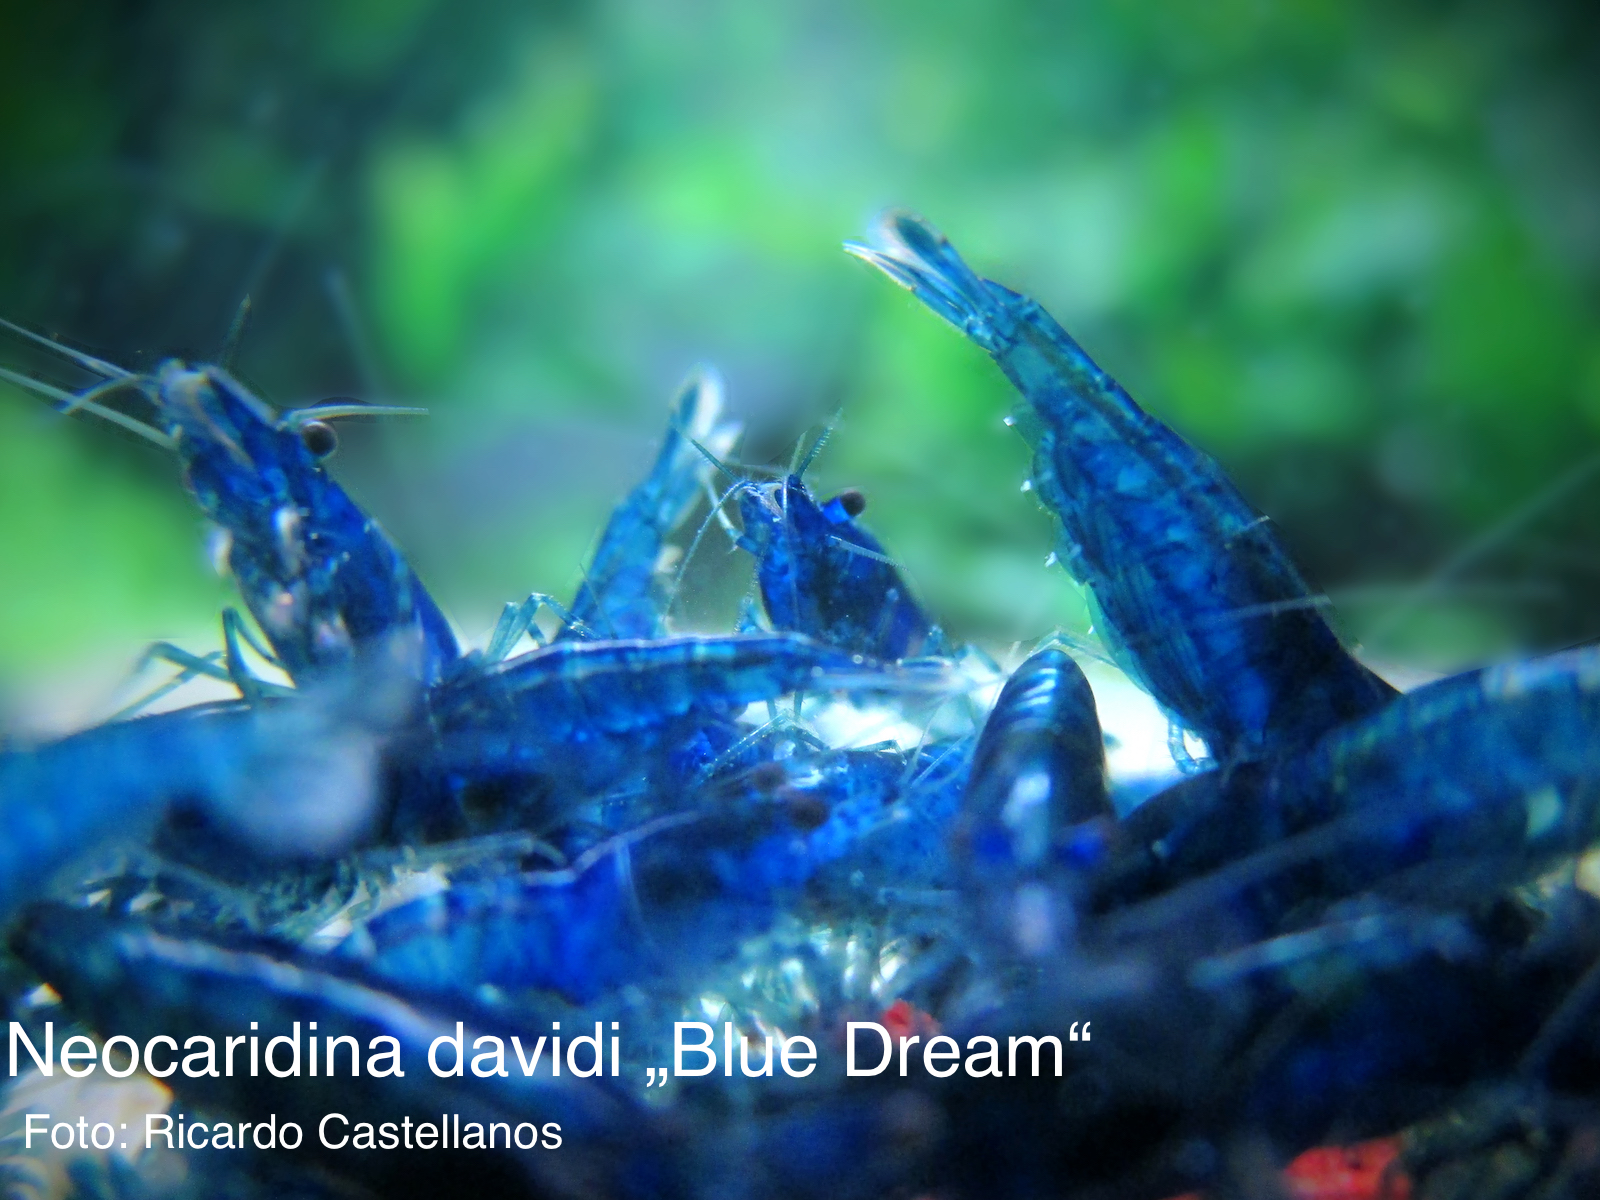 Blue_dream_neocaridina_davidi Frais De Jbl Aquarium Conception